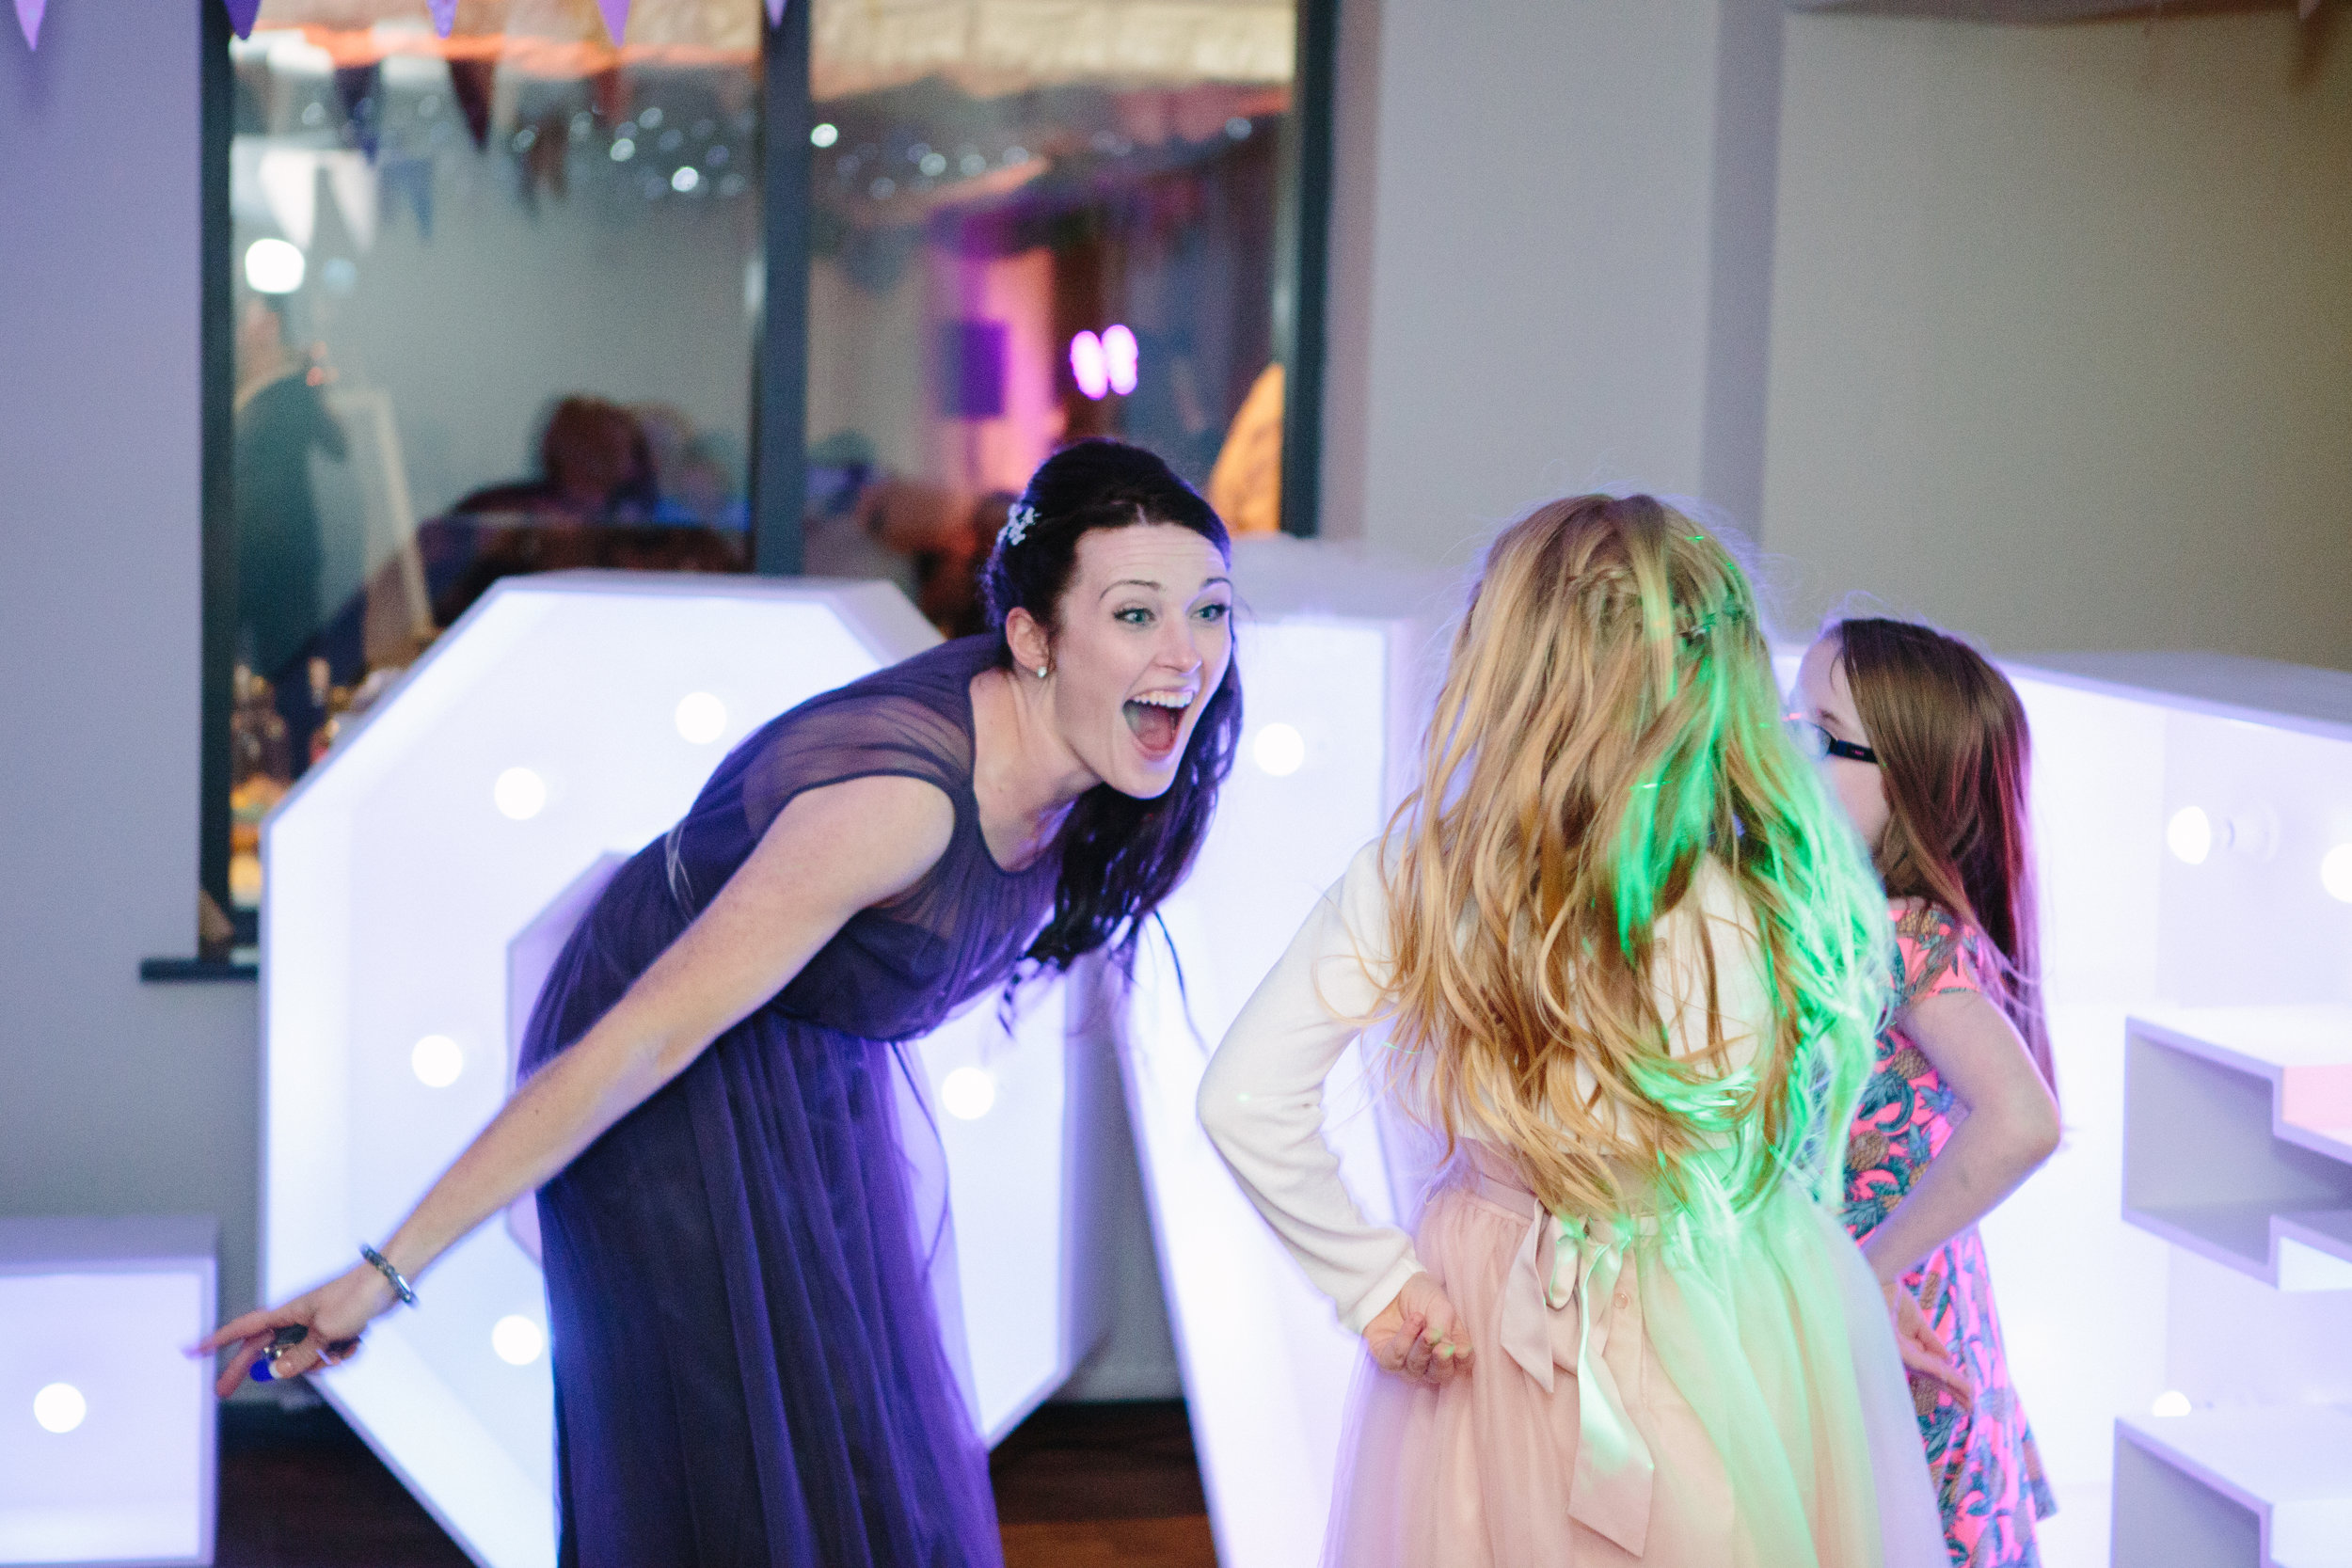 cotswalds-chipping-norton-oxfordshire-london-wedding-photography-bridesmaid-dance-50